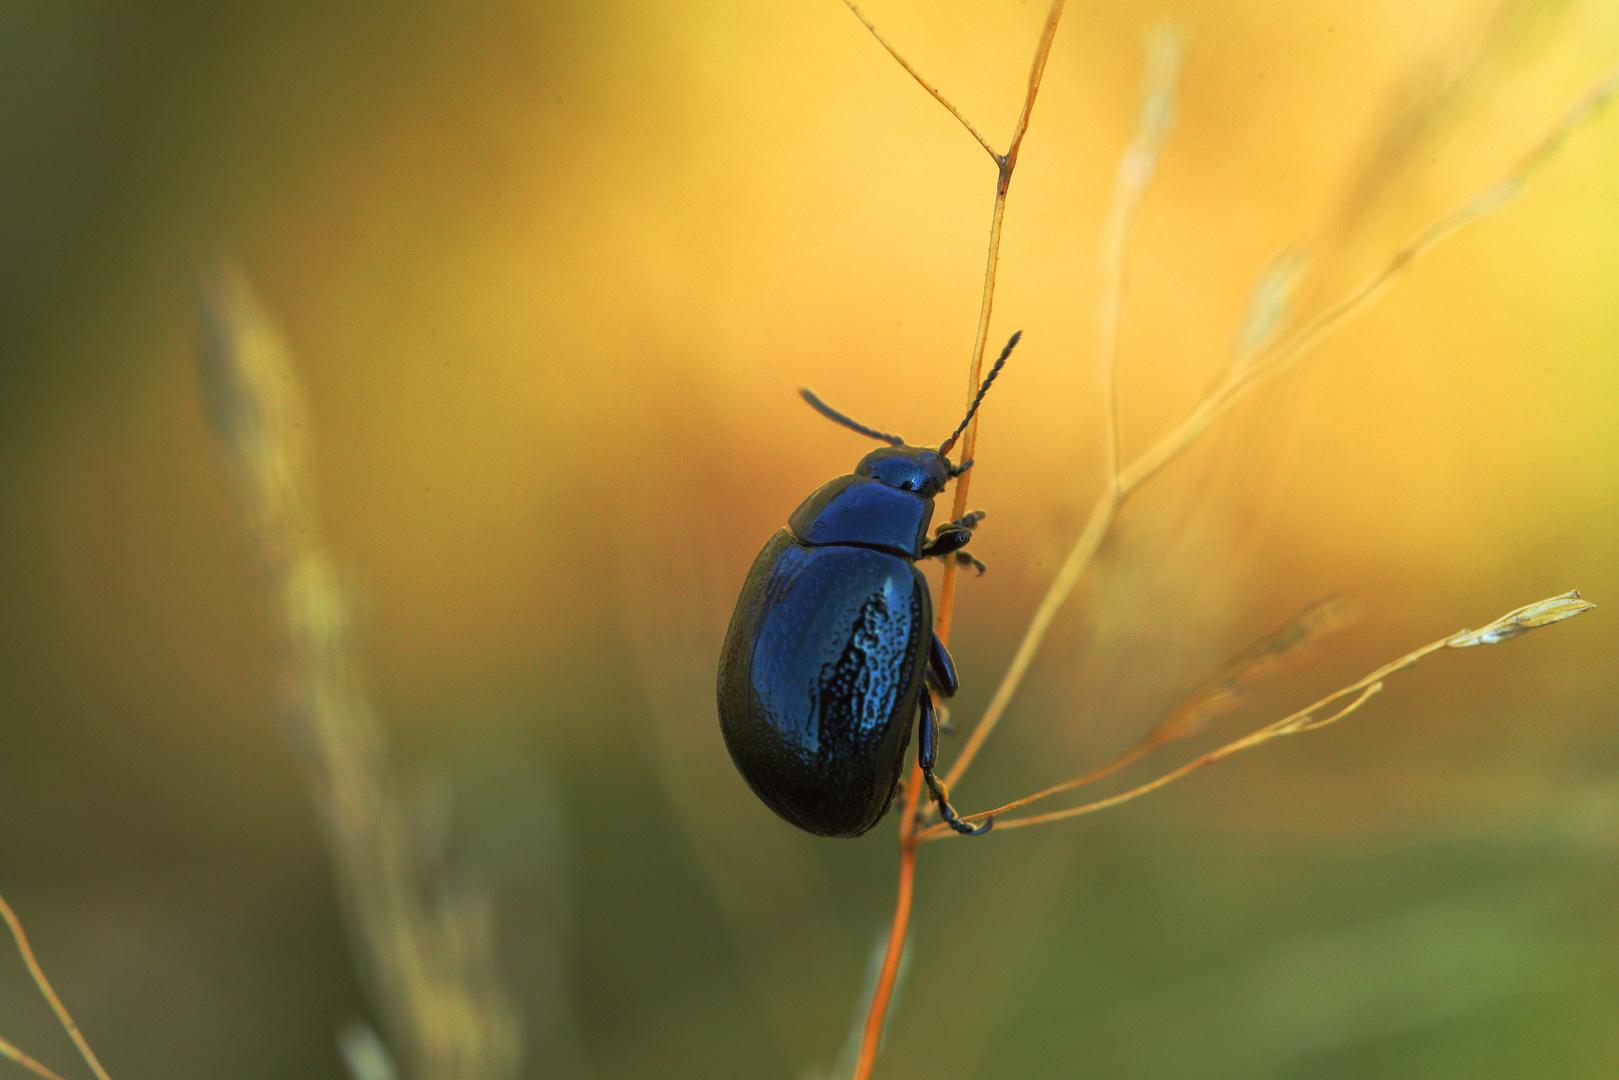 Schwarzblauer Wegerich-Blattkäfer  -  Chrysolina Haemoptera